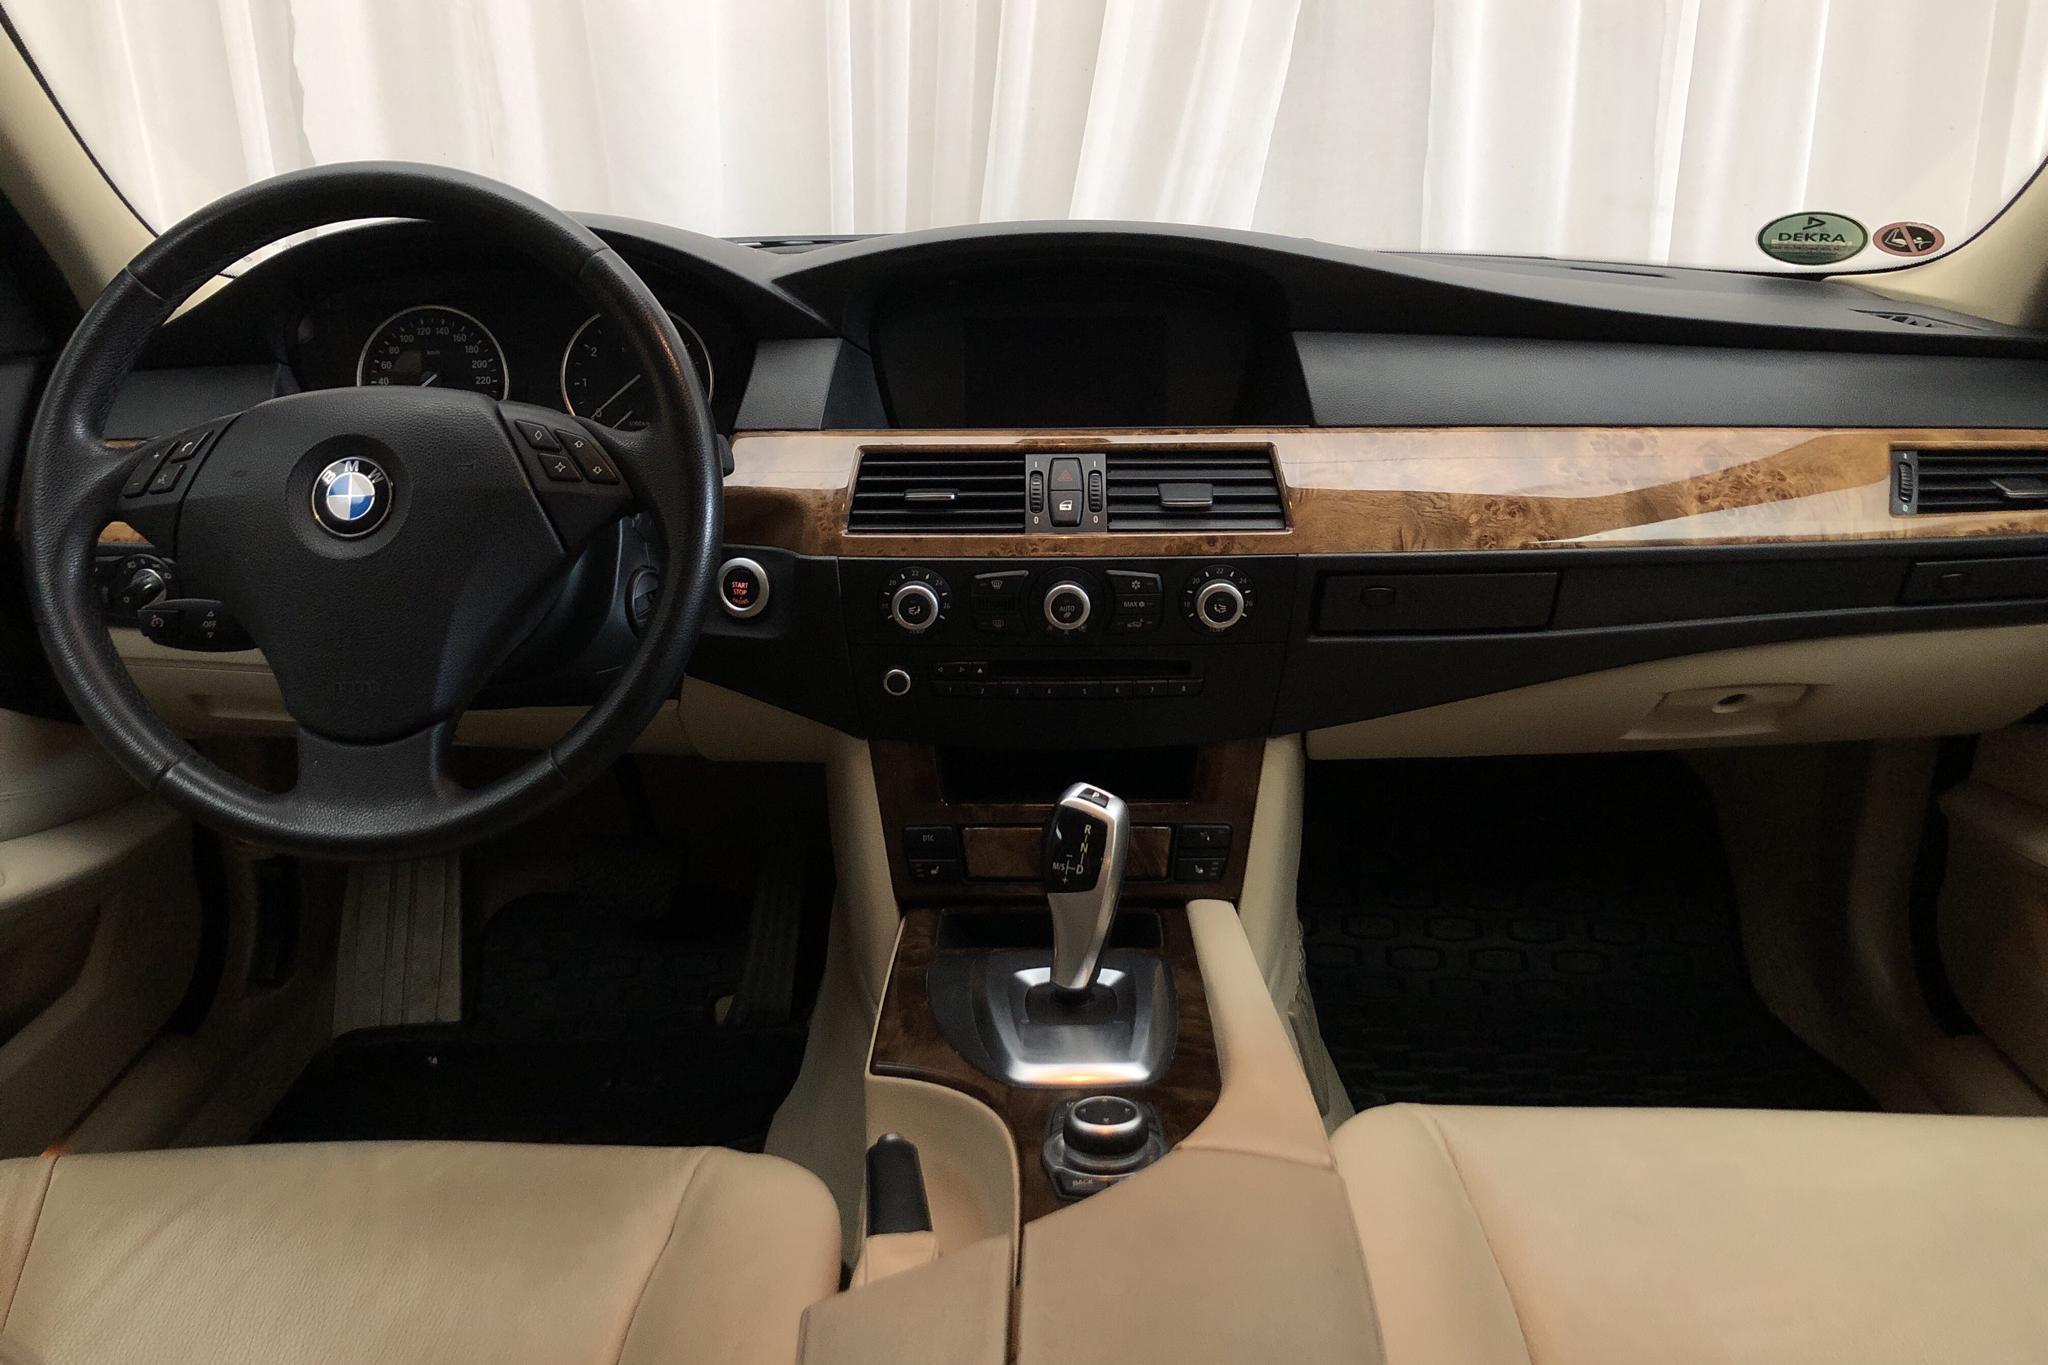 BMW 523i Touring, E61 (190hk) - 176 230 km - Automatic - white - 2009